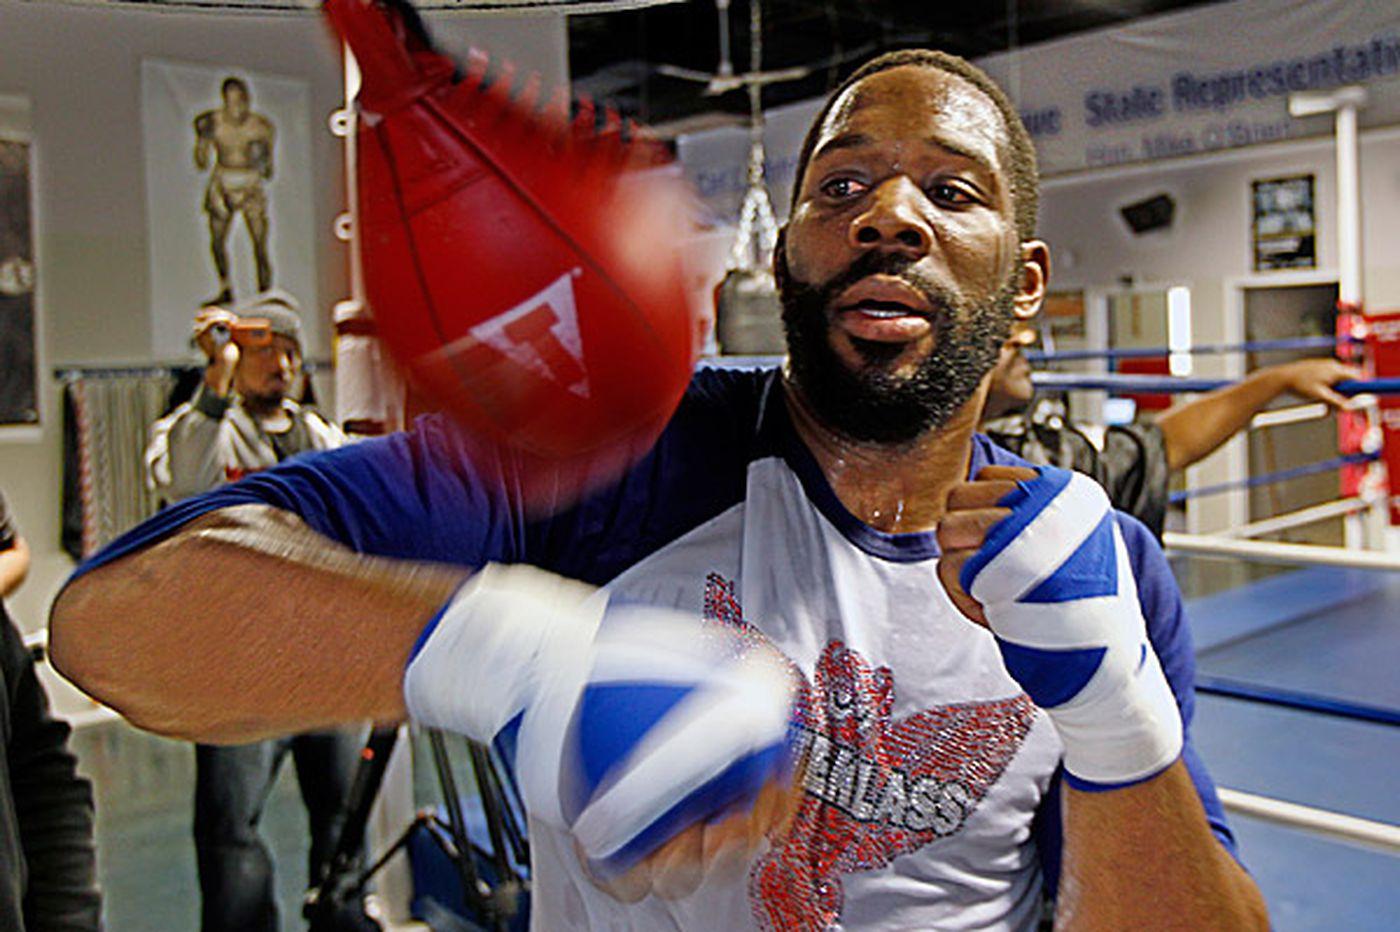 Jennings' fight canceled